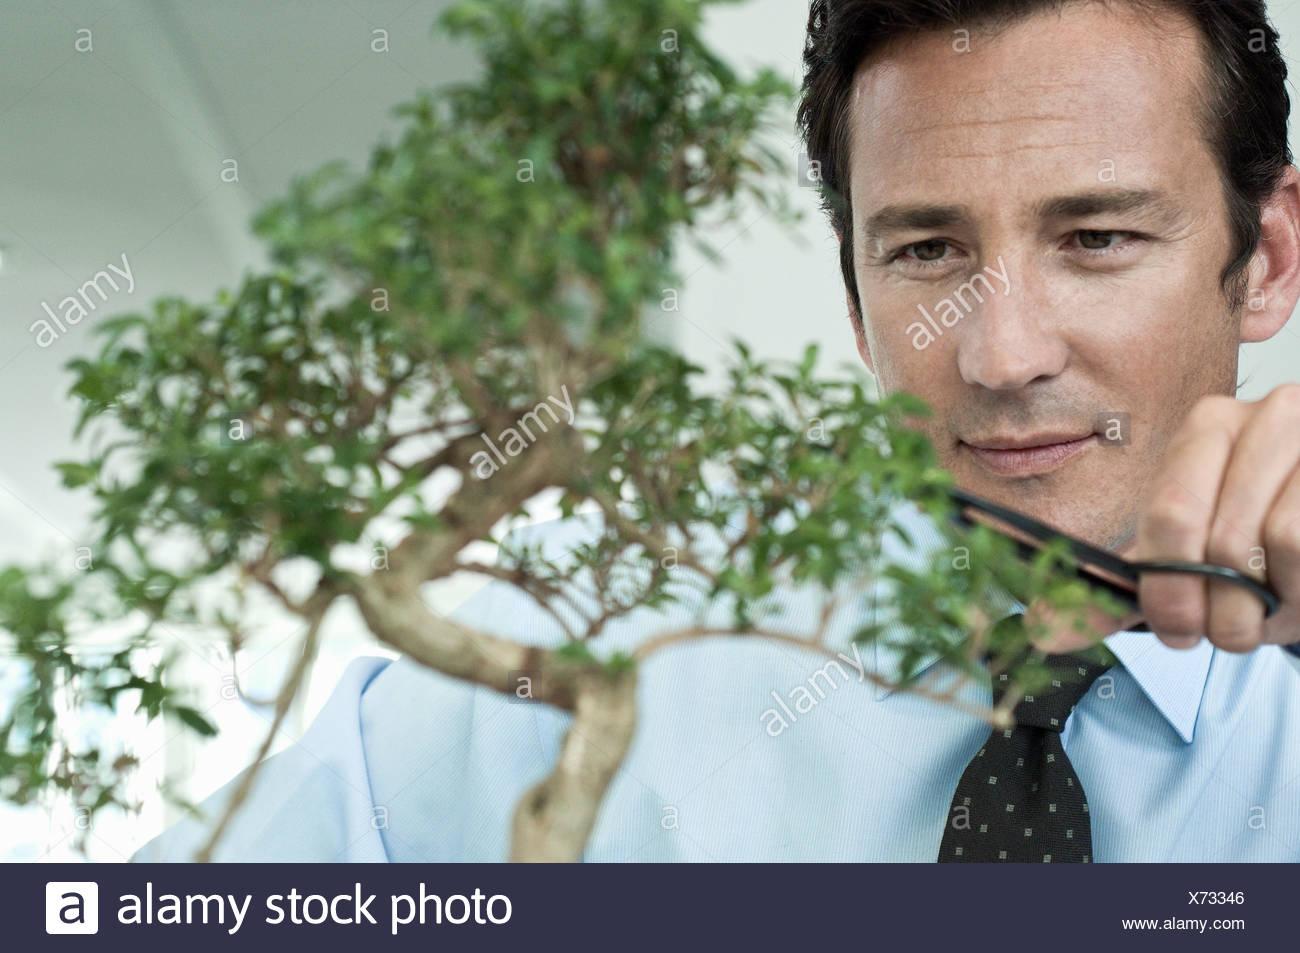 Businessman pruning bonsai tree - Stock Image